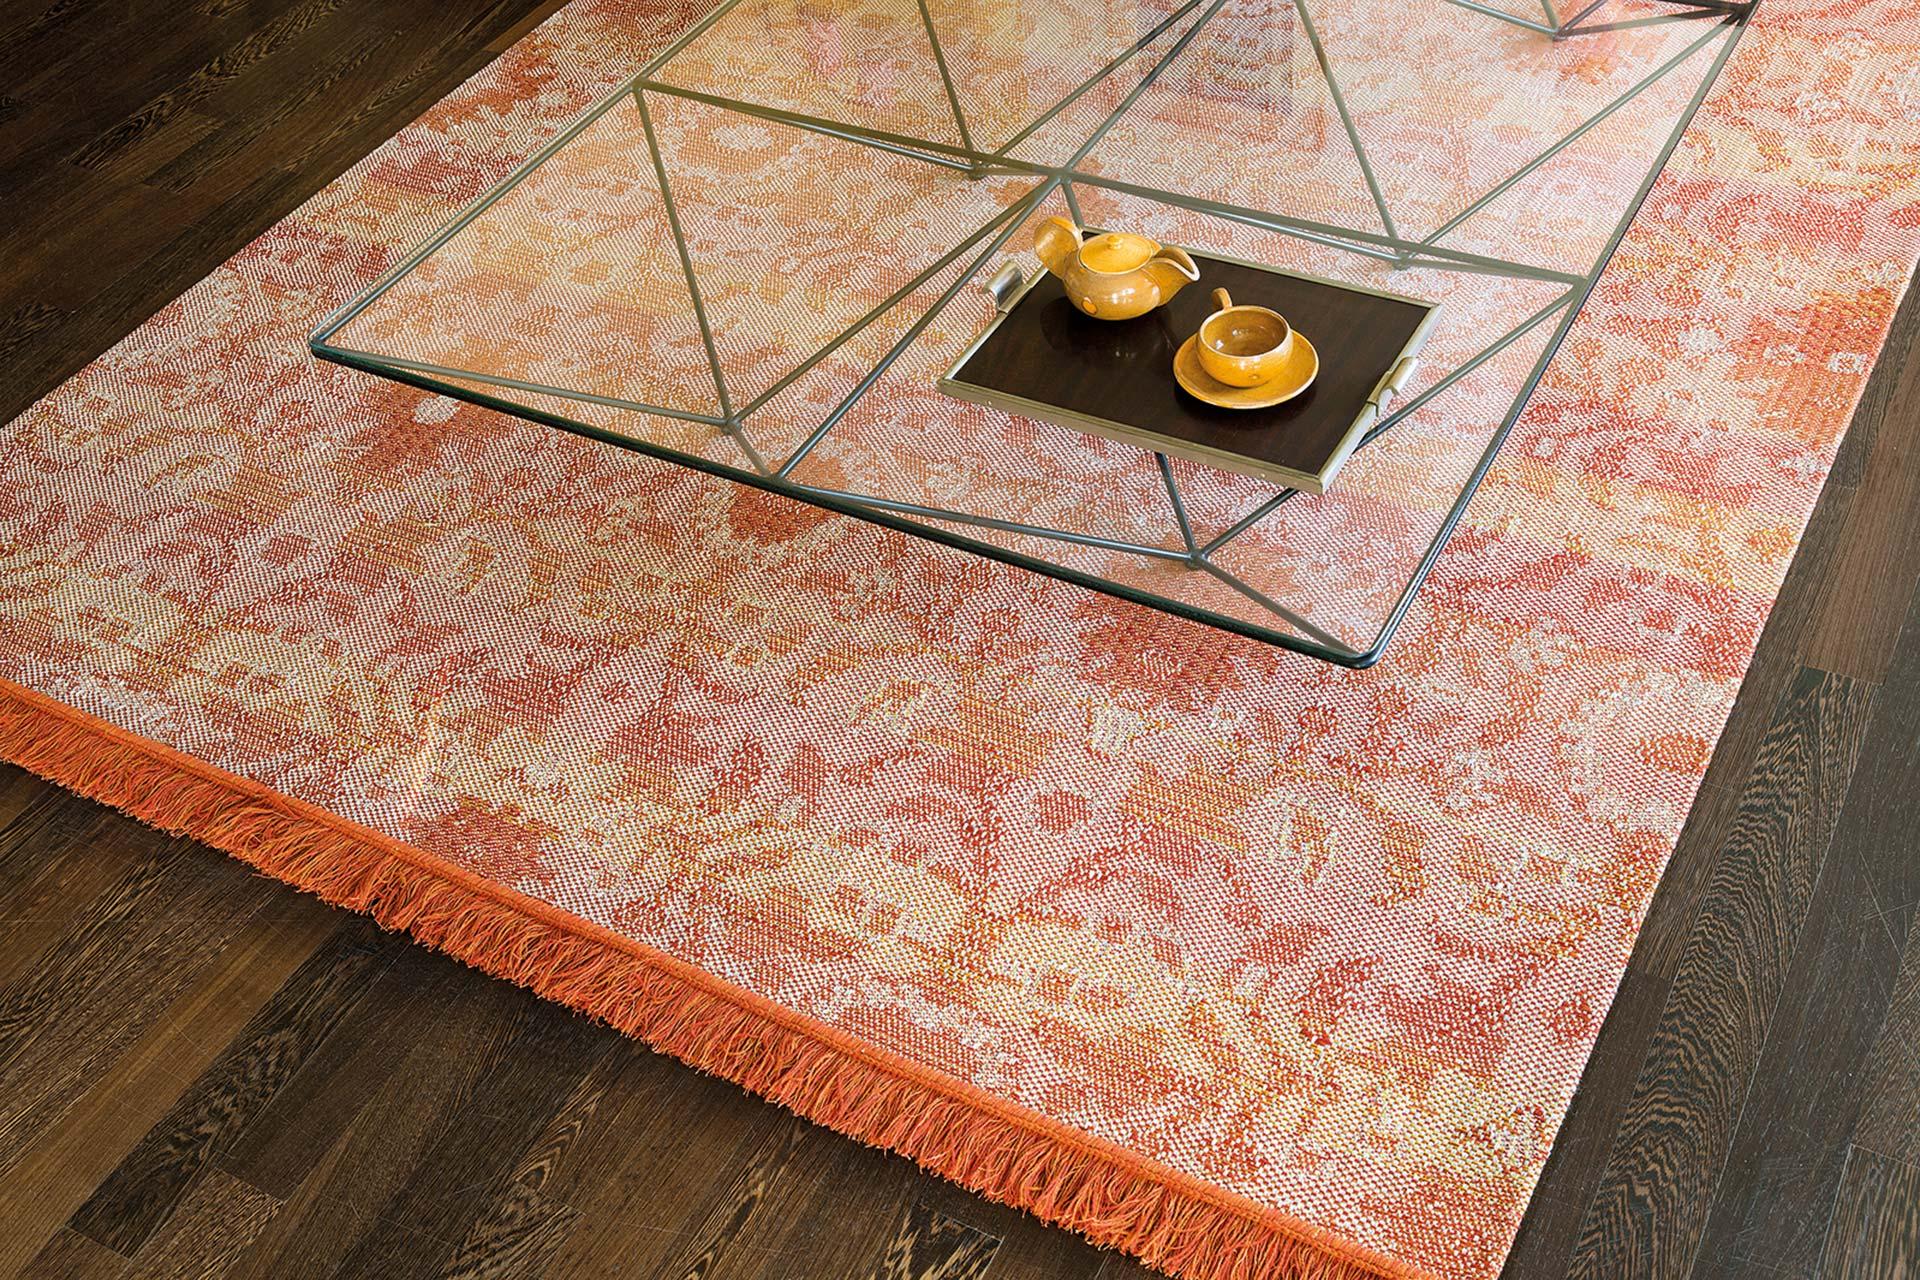 elixir_ei34582_amberglow_sfeerbeeld_limited-edition_carpets.jpg